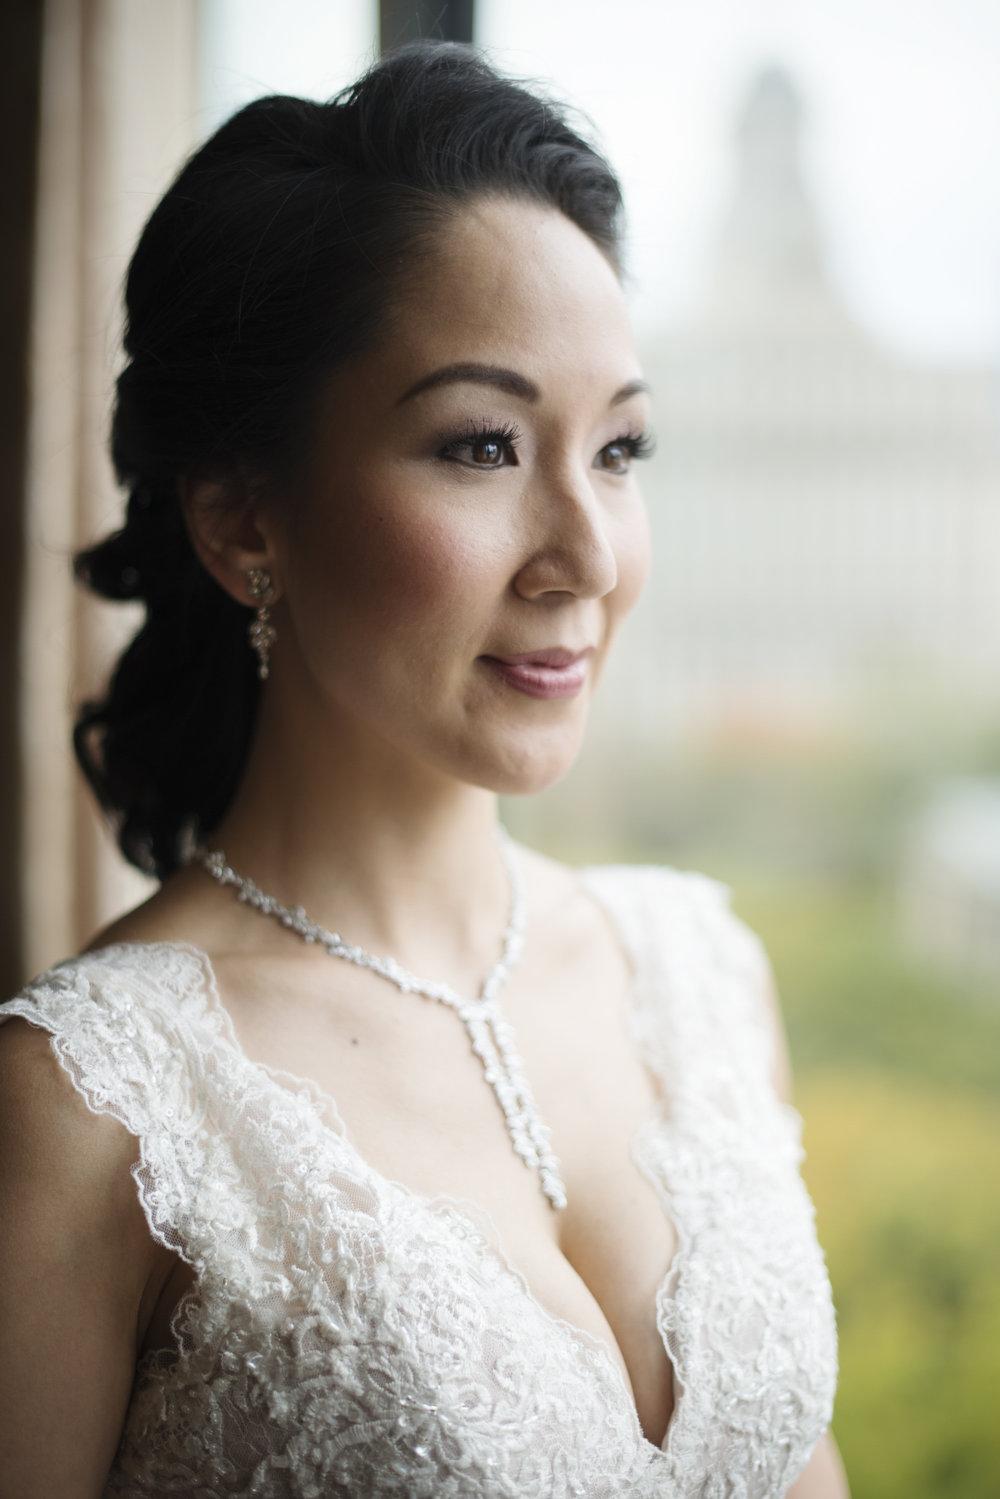 RosewoodWeddingPhotos-VanJohn-Toronto-FourSeasonToronto-CityHall-Elopement-TorontoWedding-TorontoCityHall-Bride-BridePortrait